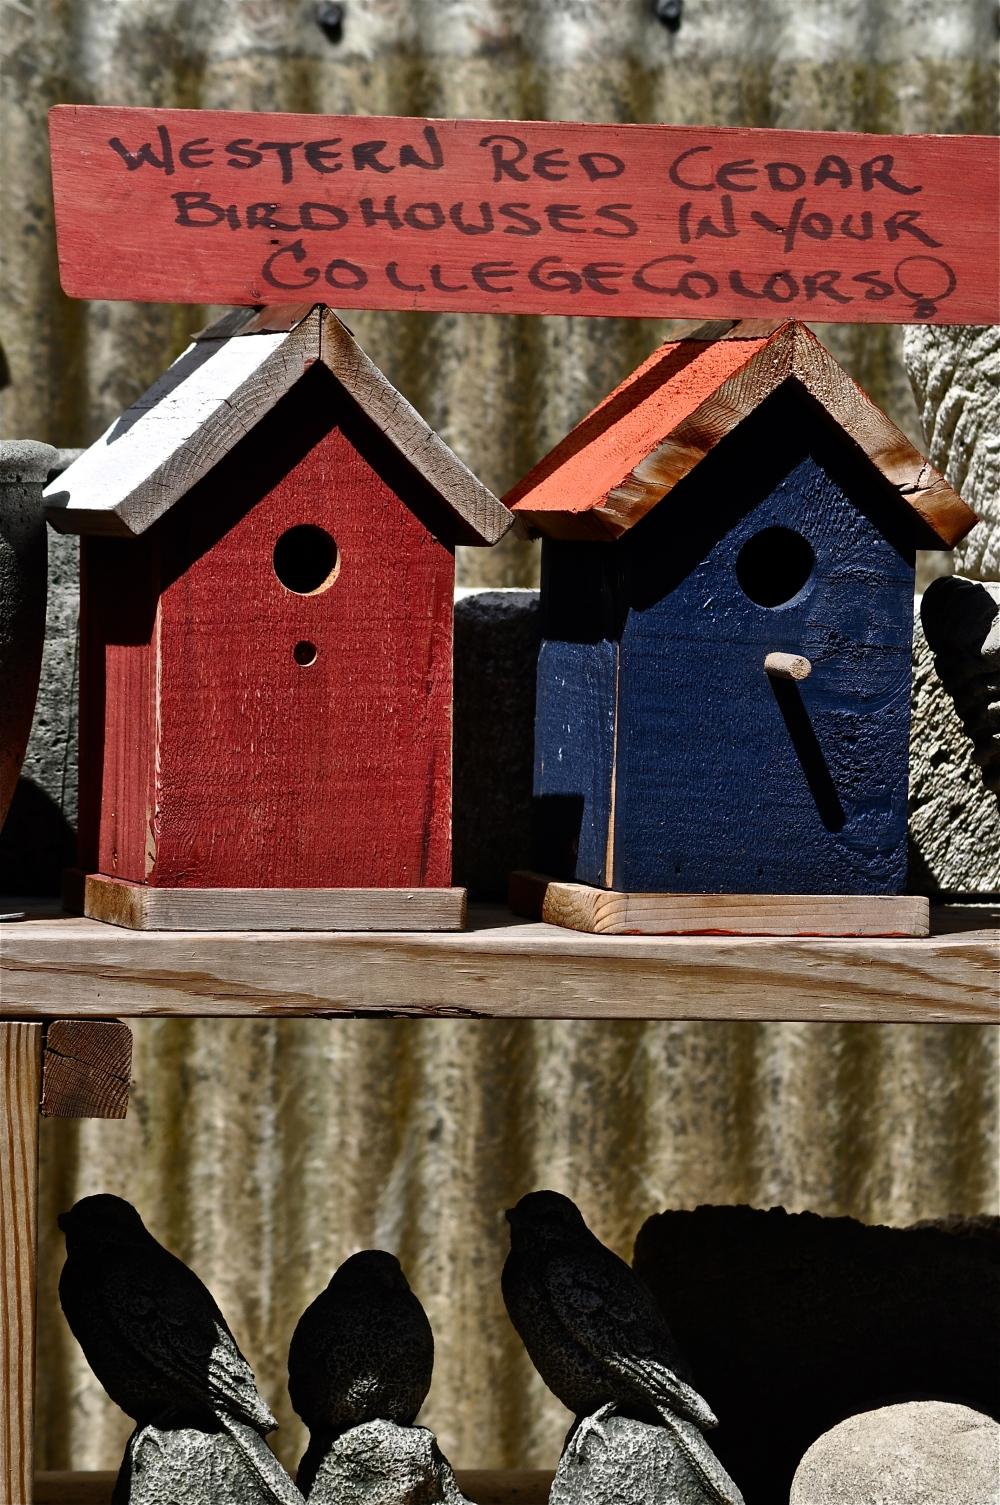 Alabama or Auburn colors, painted on birdhouses I wonder if the birds